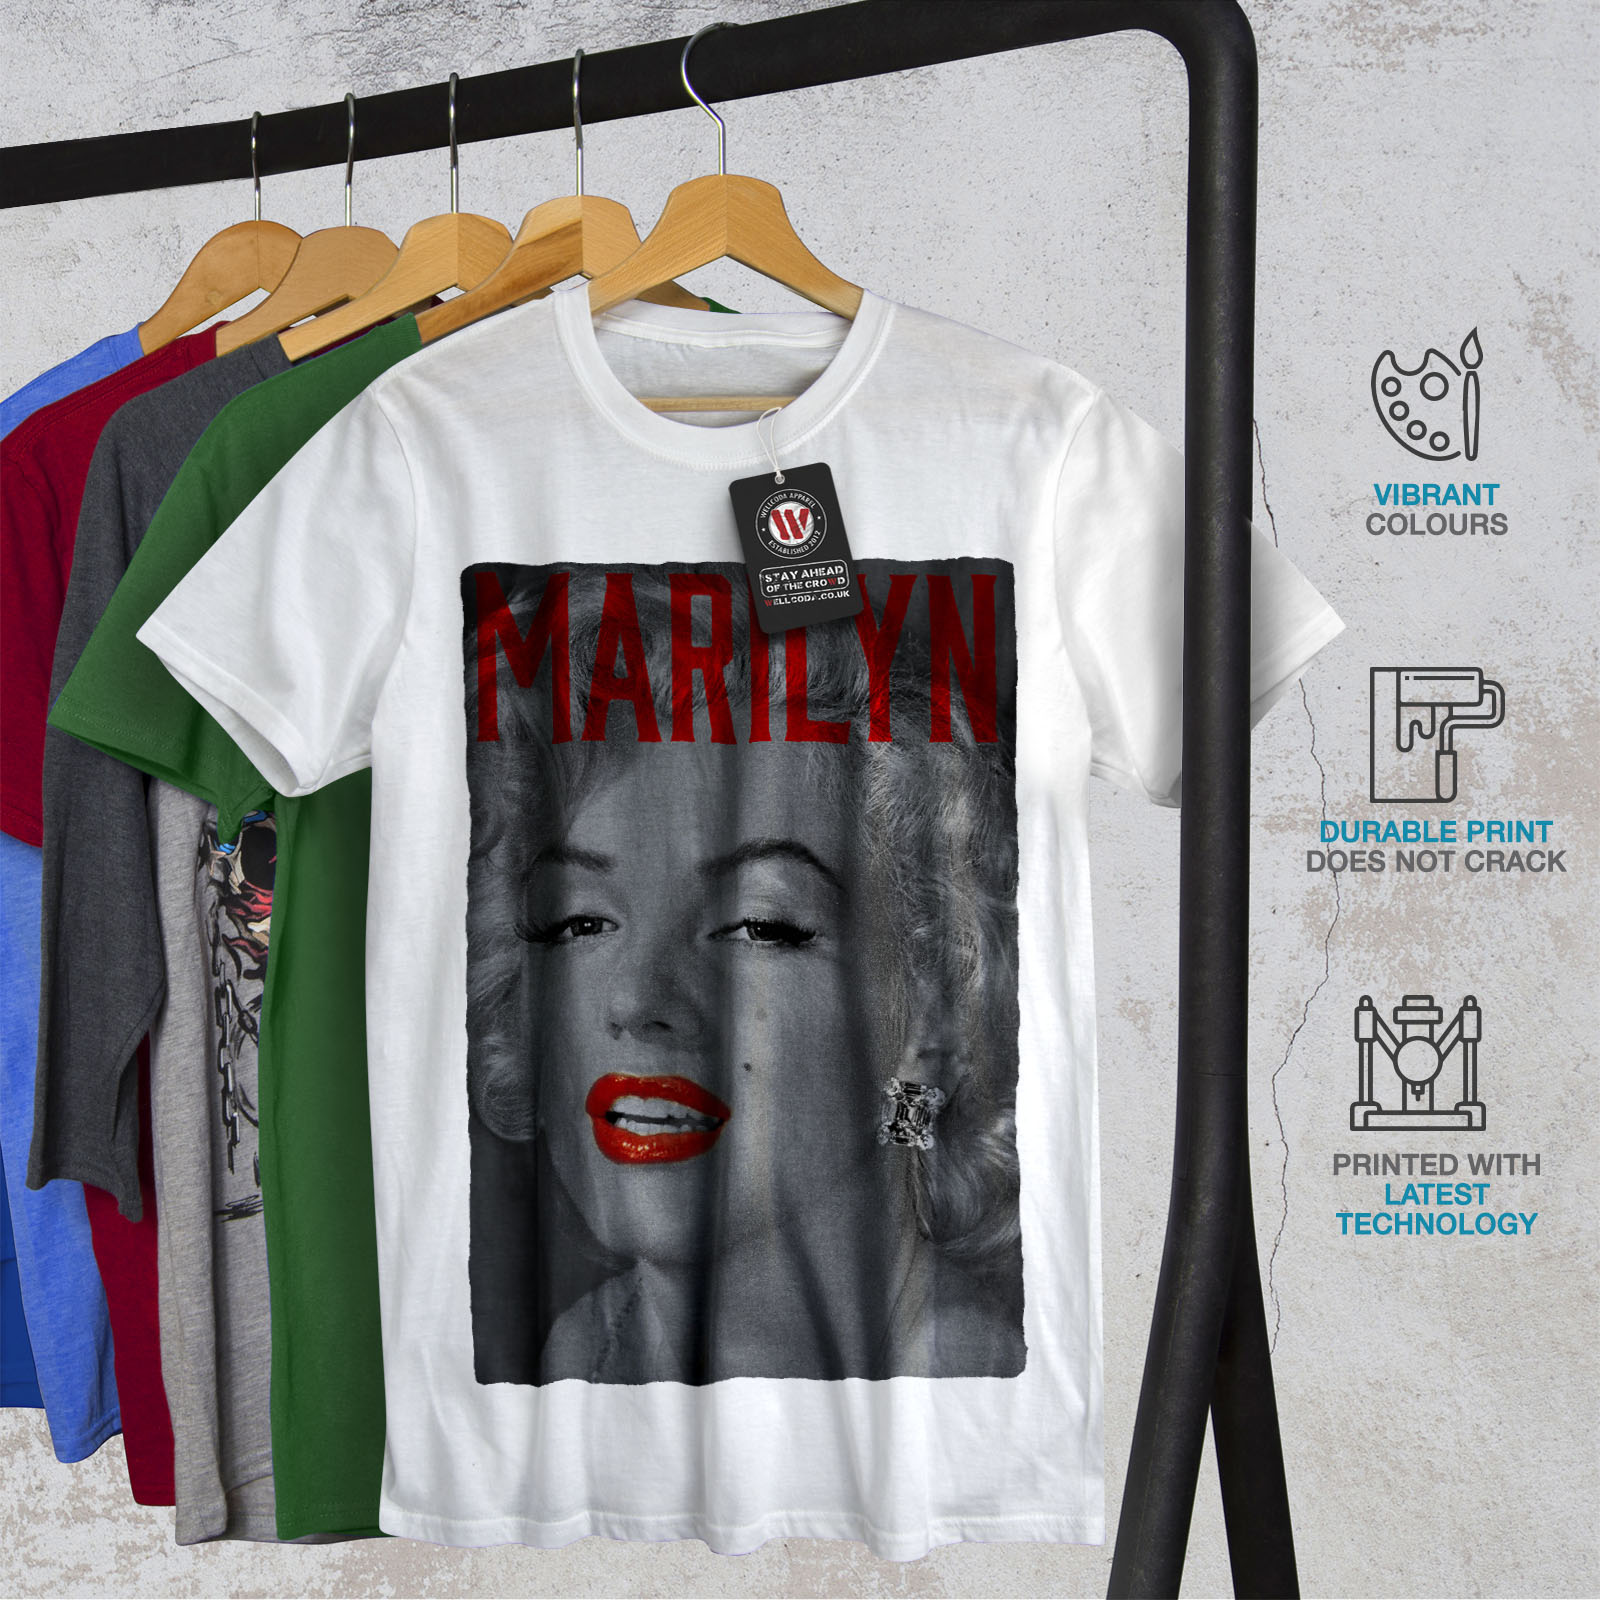 Wellcoda-Marilyn-Retro-Photo-Mens-T-shirt-Urban-Graphic-Design-Printed-Tee thumbnail 12